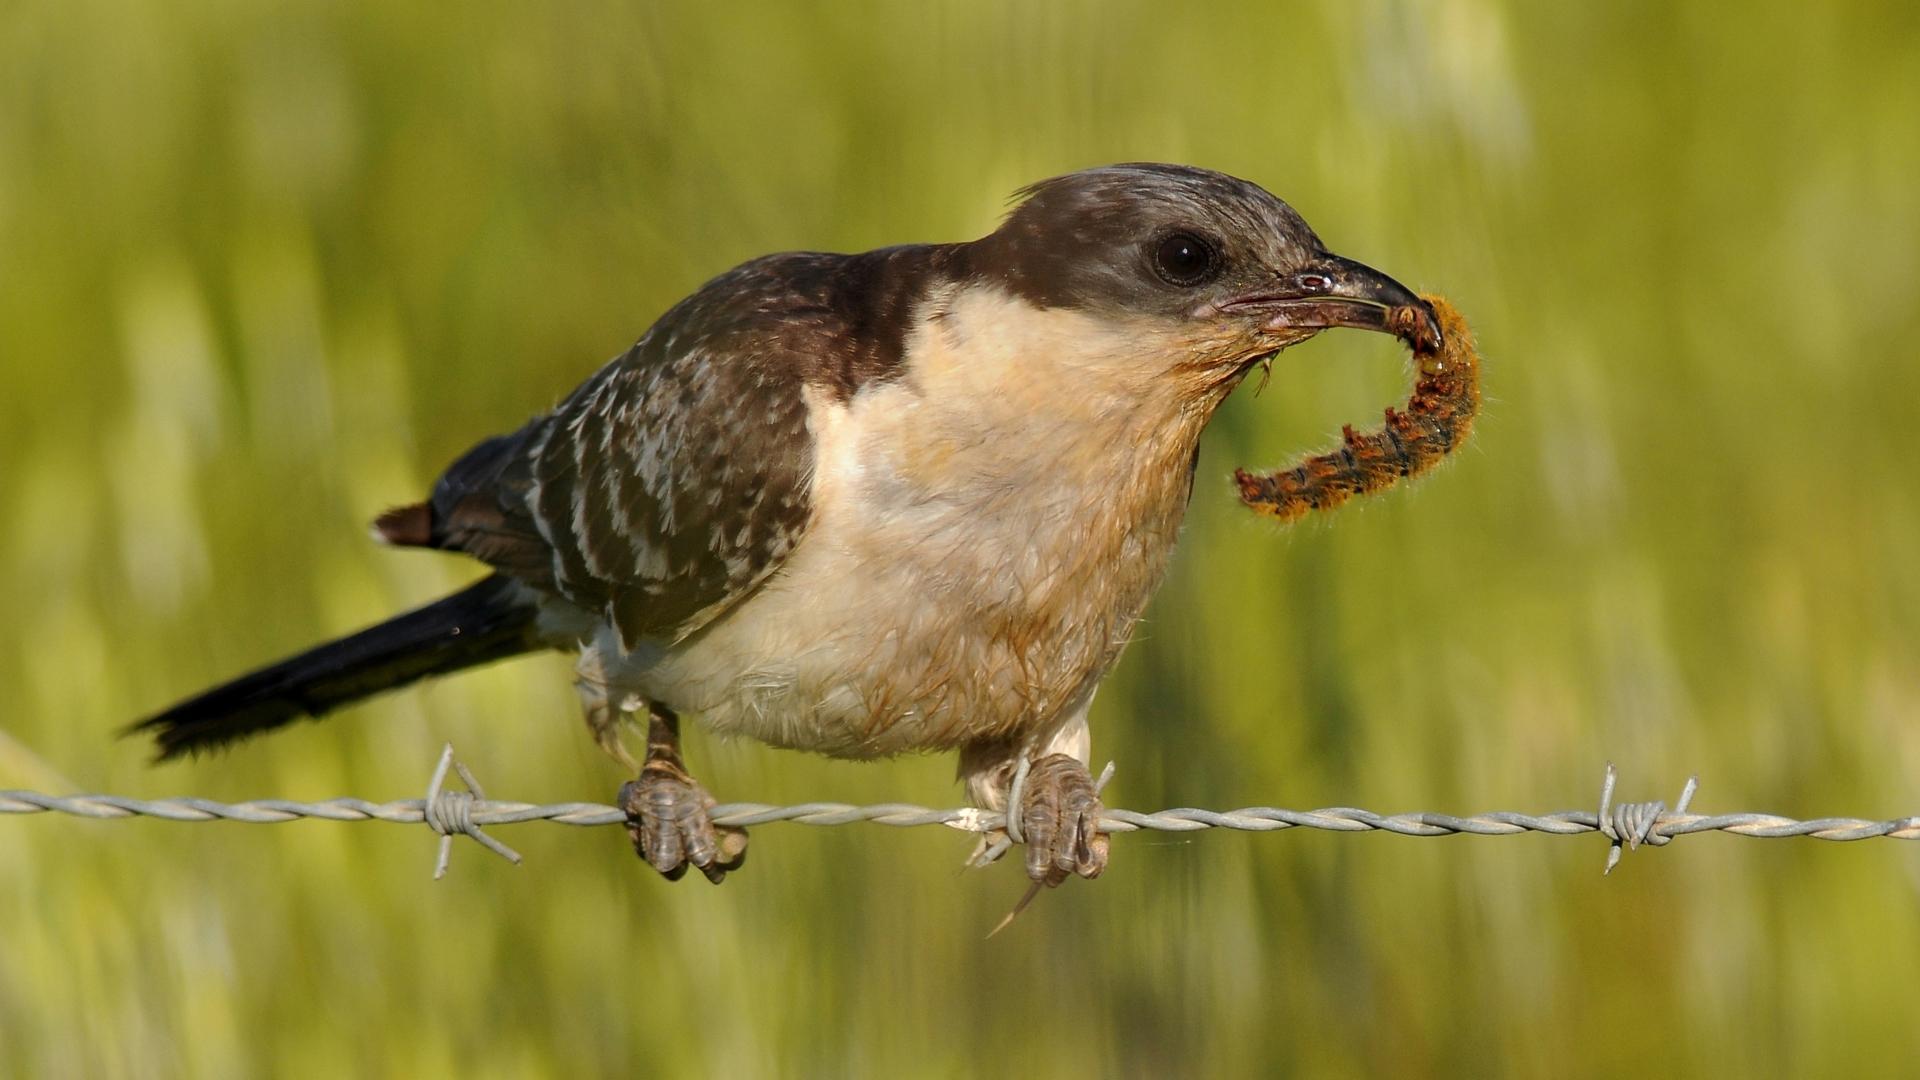 Паразит на страже хозяйского гнезда